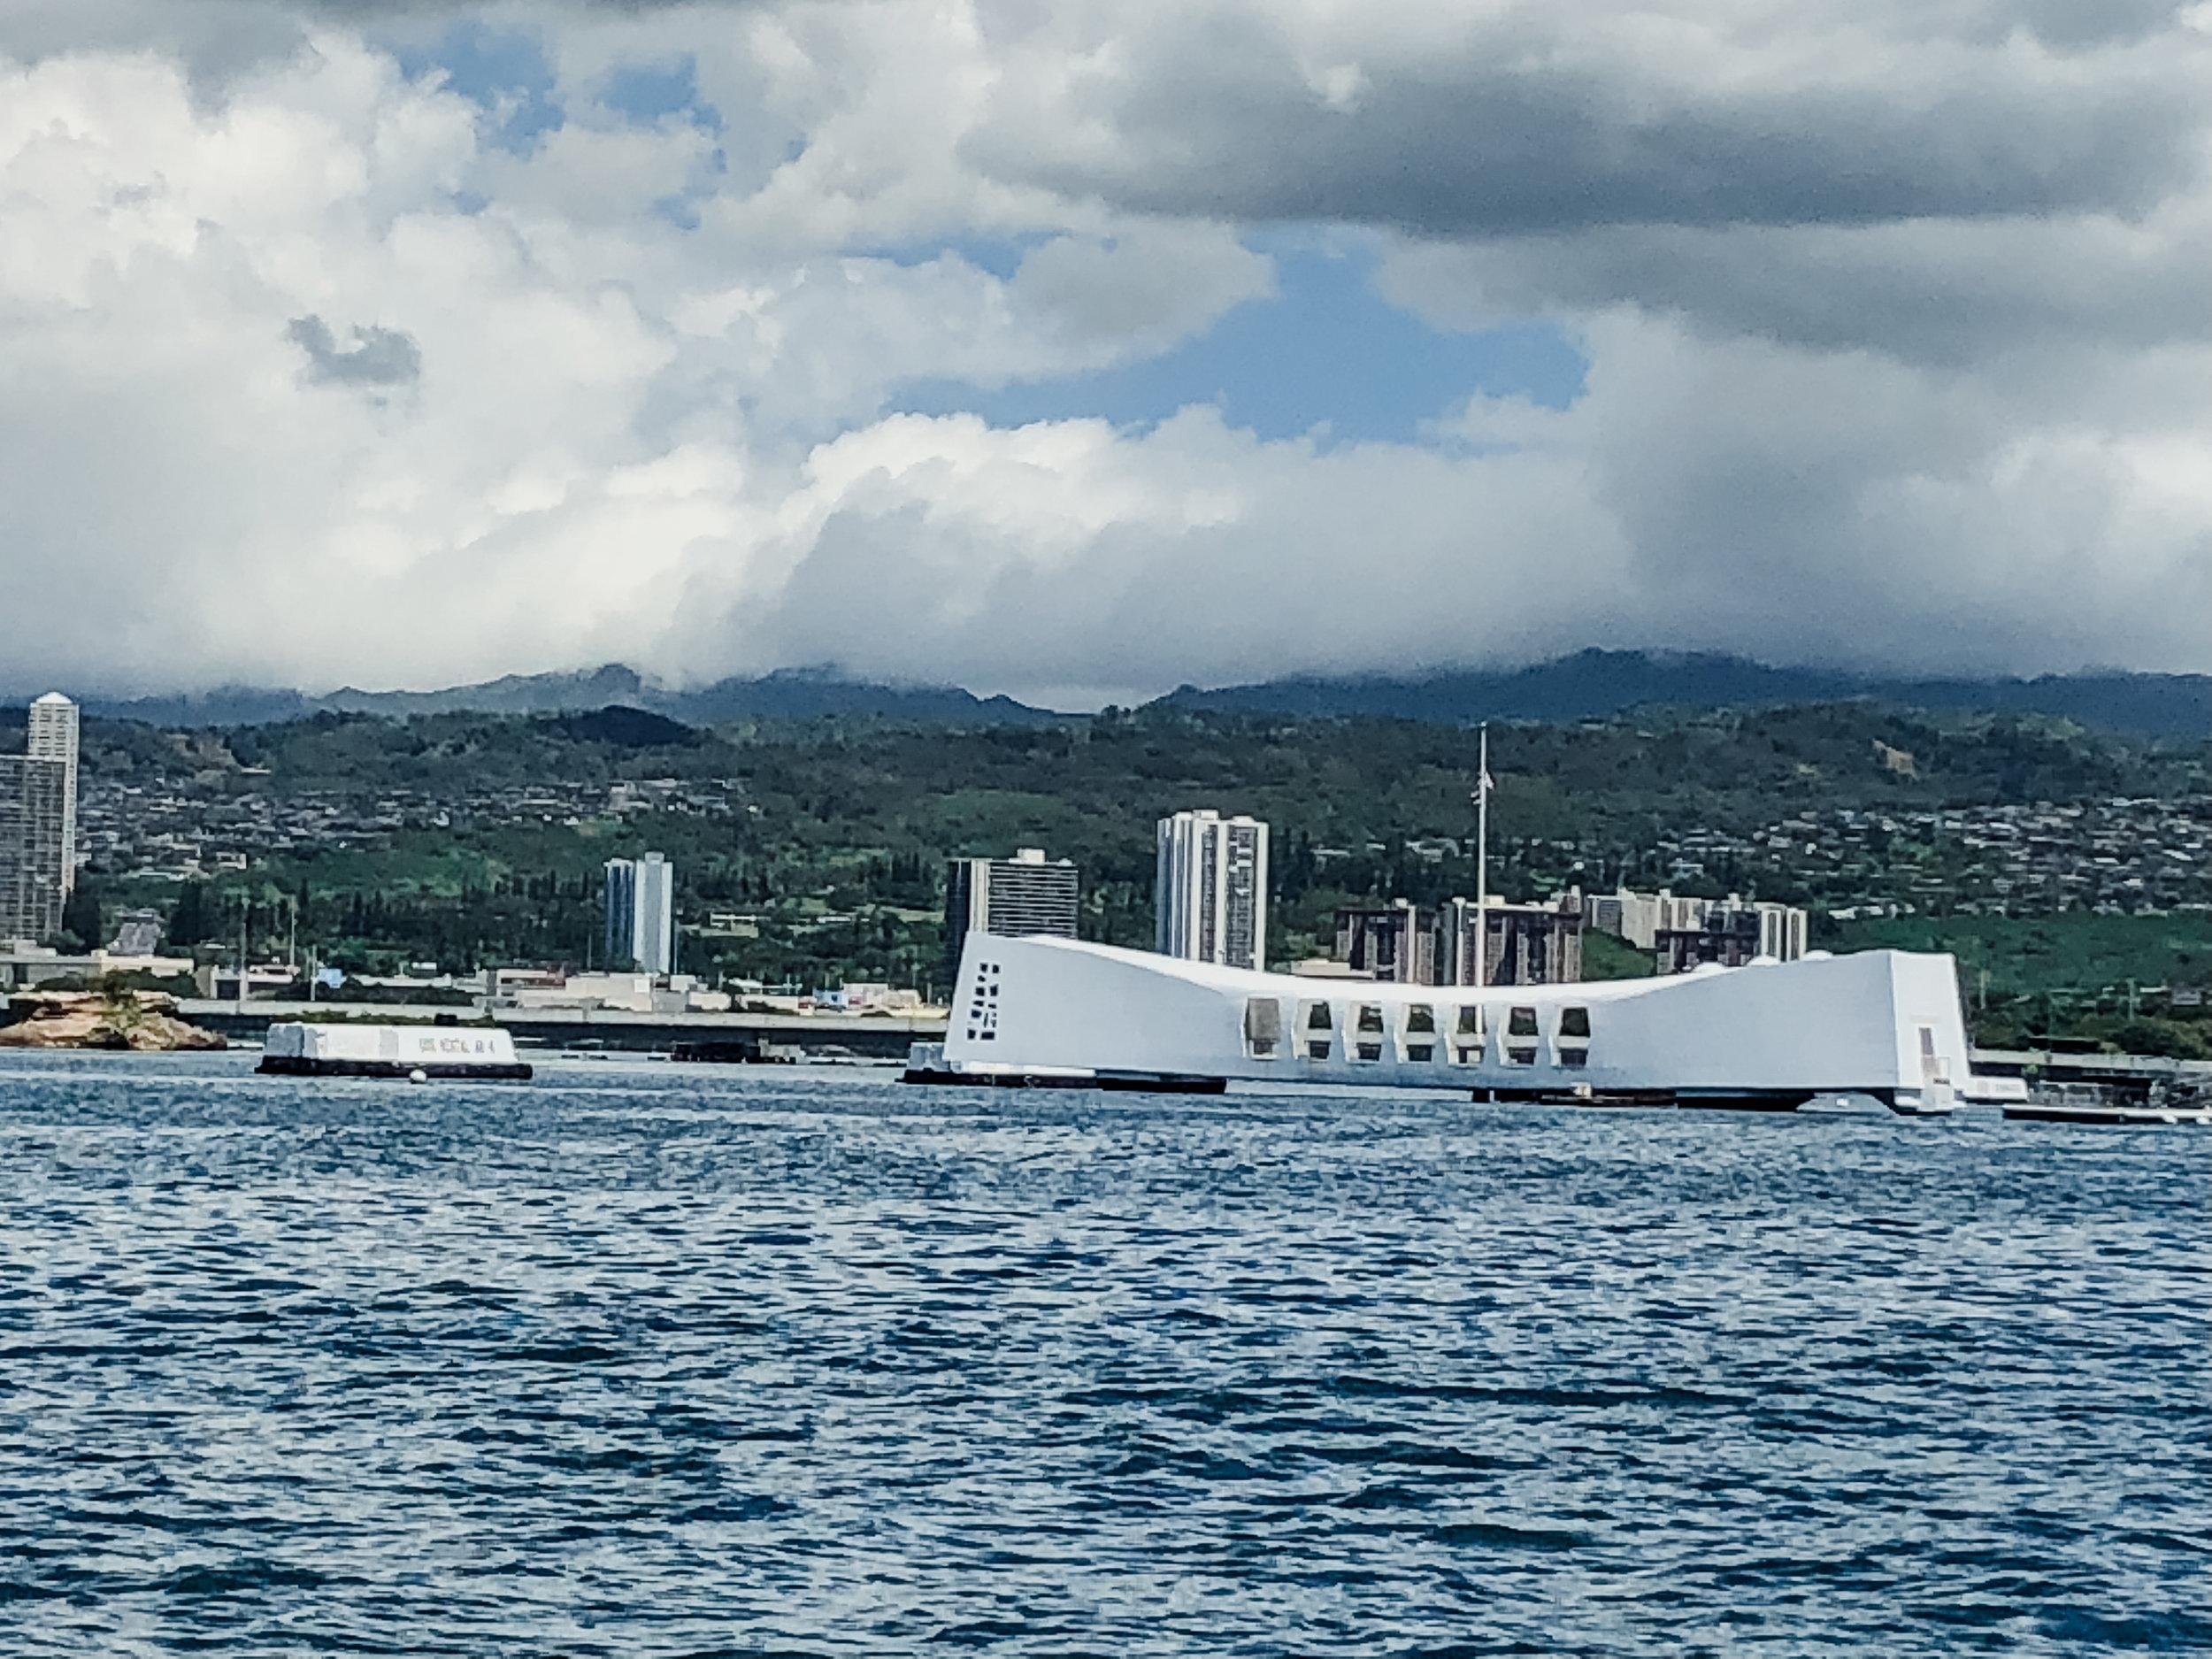 meagans hawaii pics-38.jpg